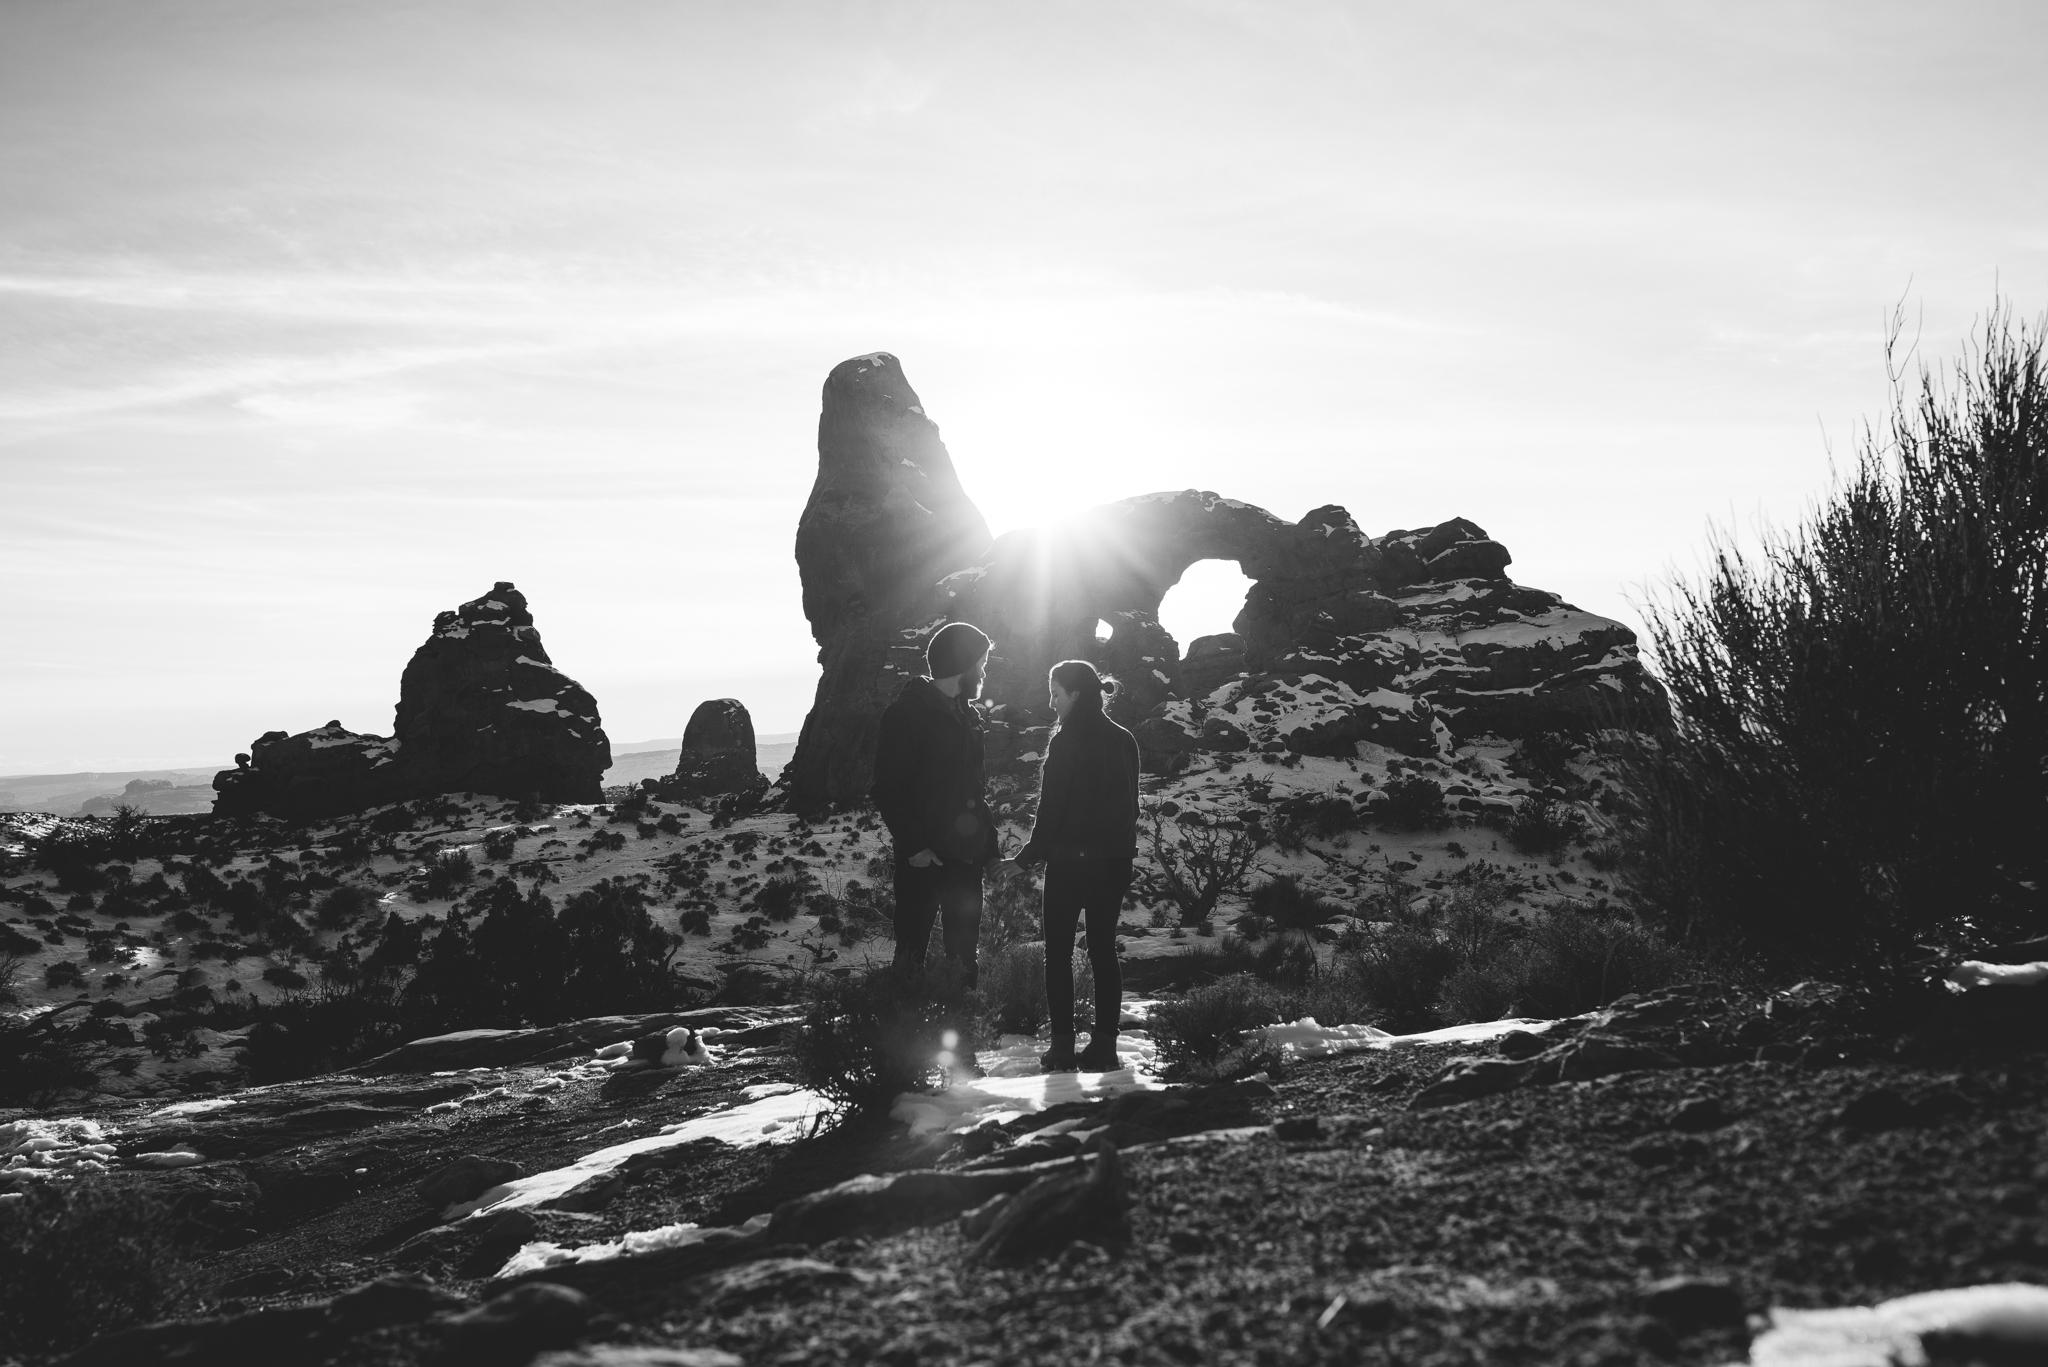 Isaiah-&-Taylor-Photography---White-Sand-Dunes-19.jpg